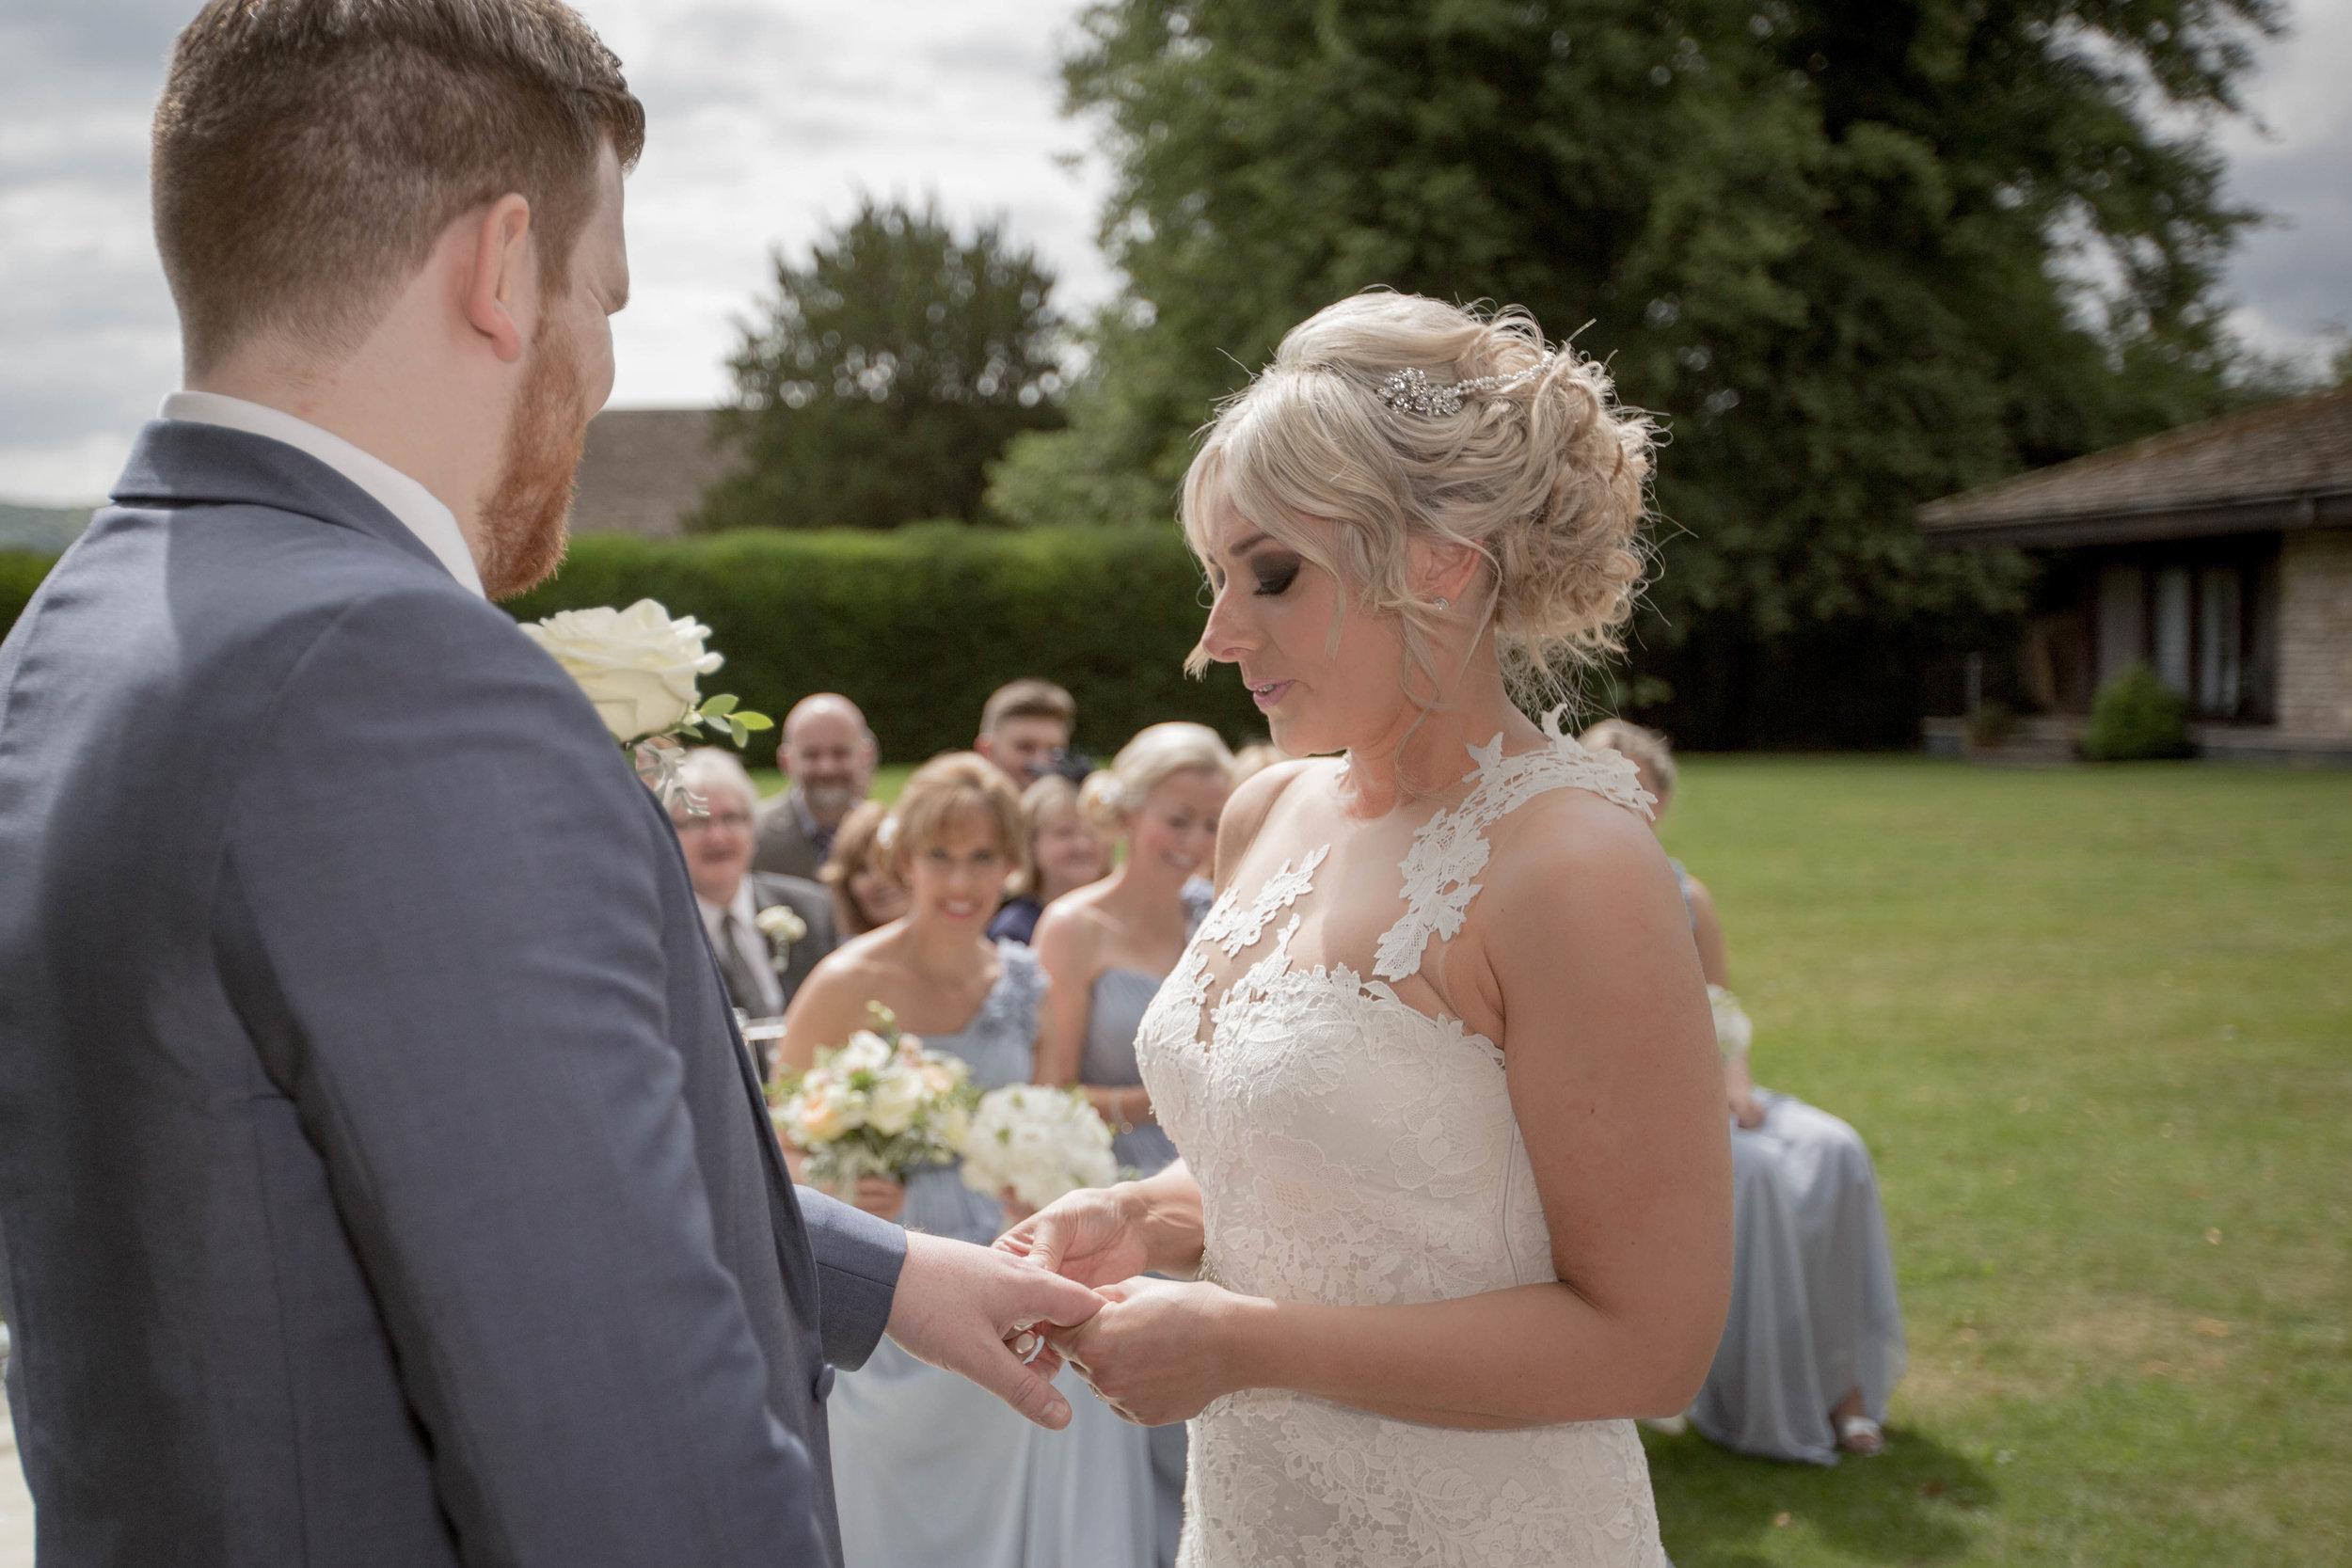 cotswold-wedding-photography-at-stonehouse-court-hotel-natalia-smith-photography-gloucestershire-wedding-photographer-39.jpg